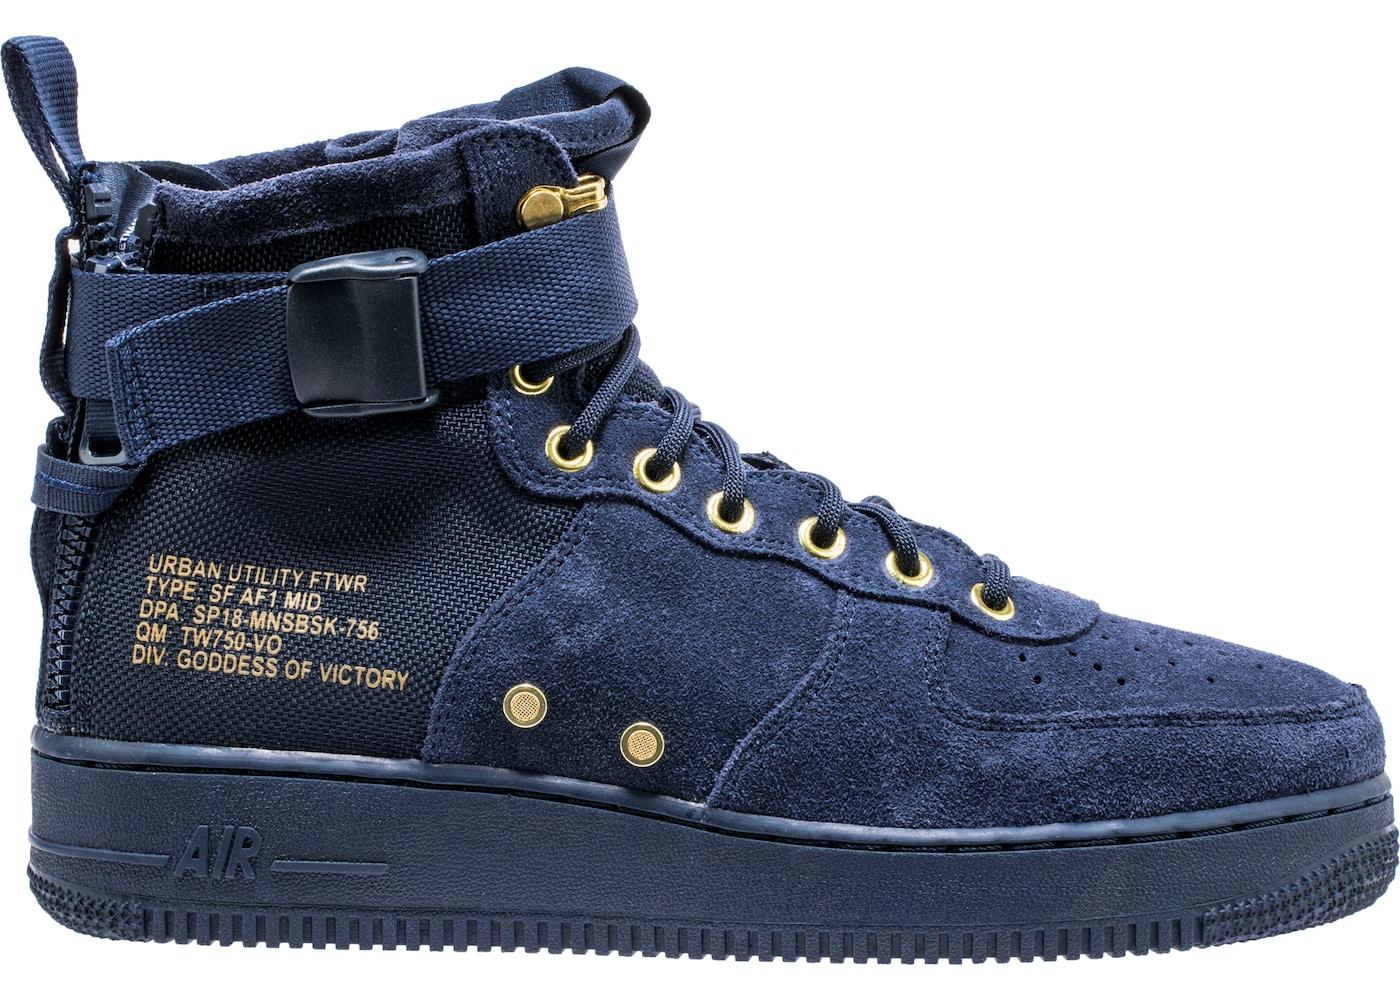 Nike SF Air Force 1 Mid Obsidian Metallic Gold